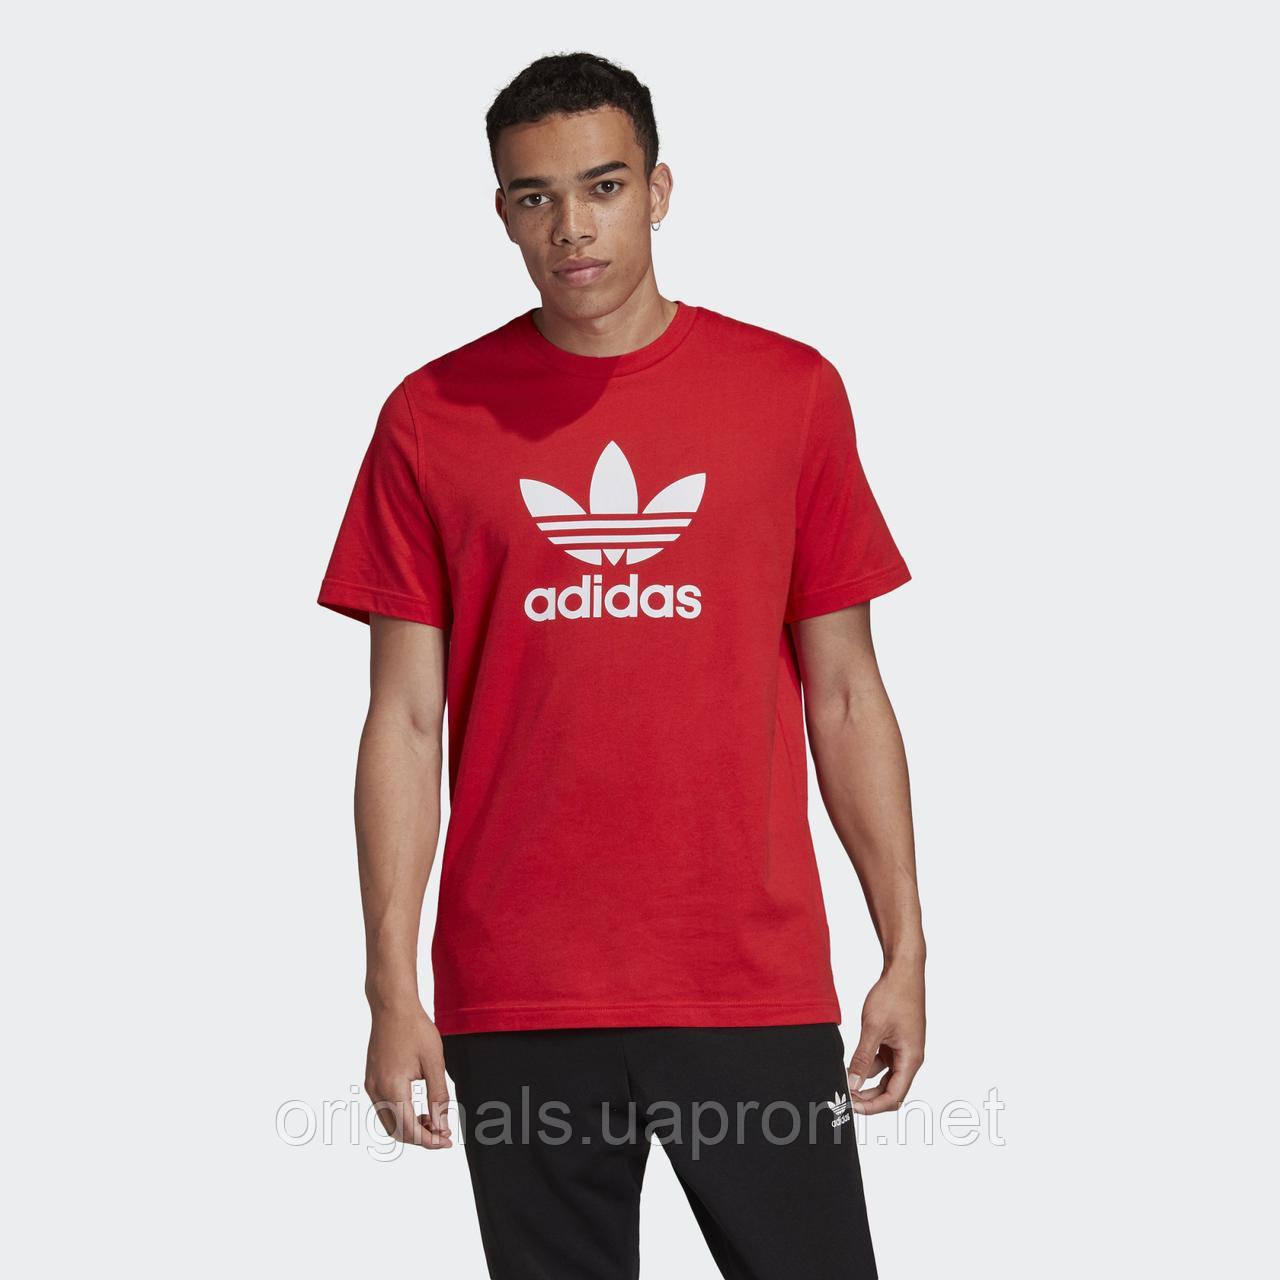 Мужская футболка Adidas Trefoil M FM3791 2020